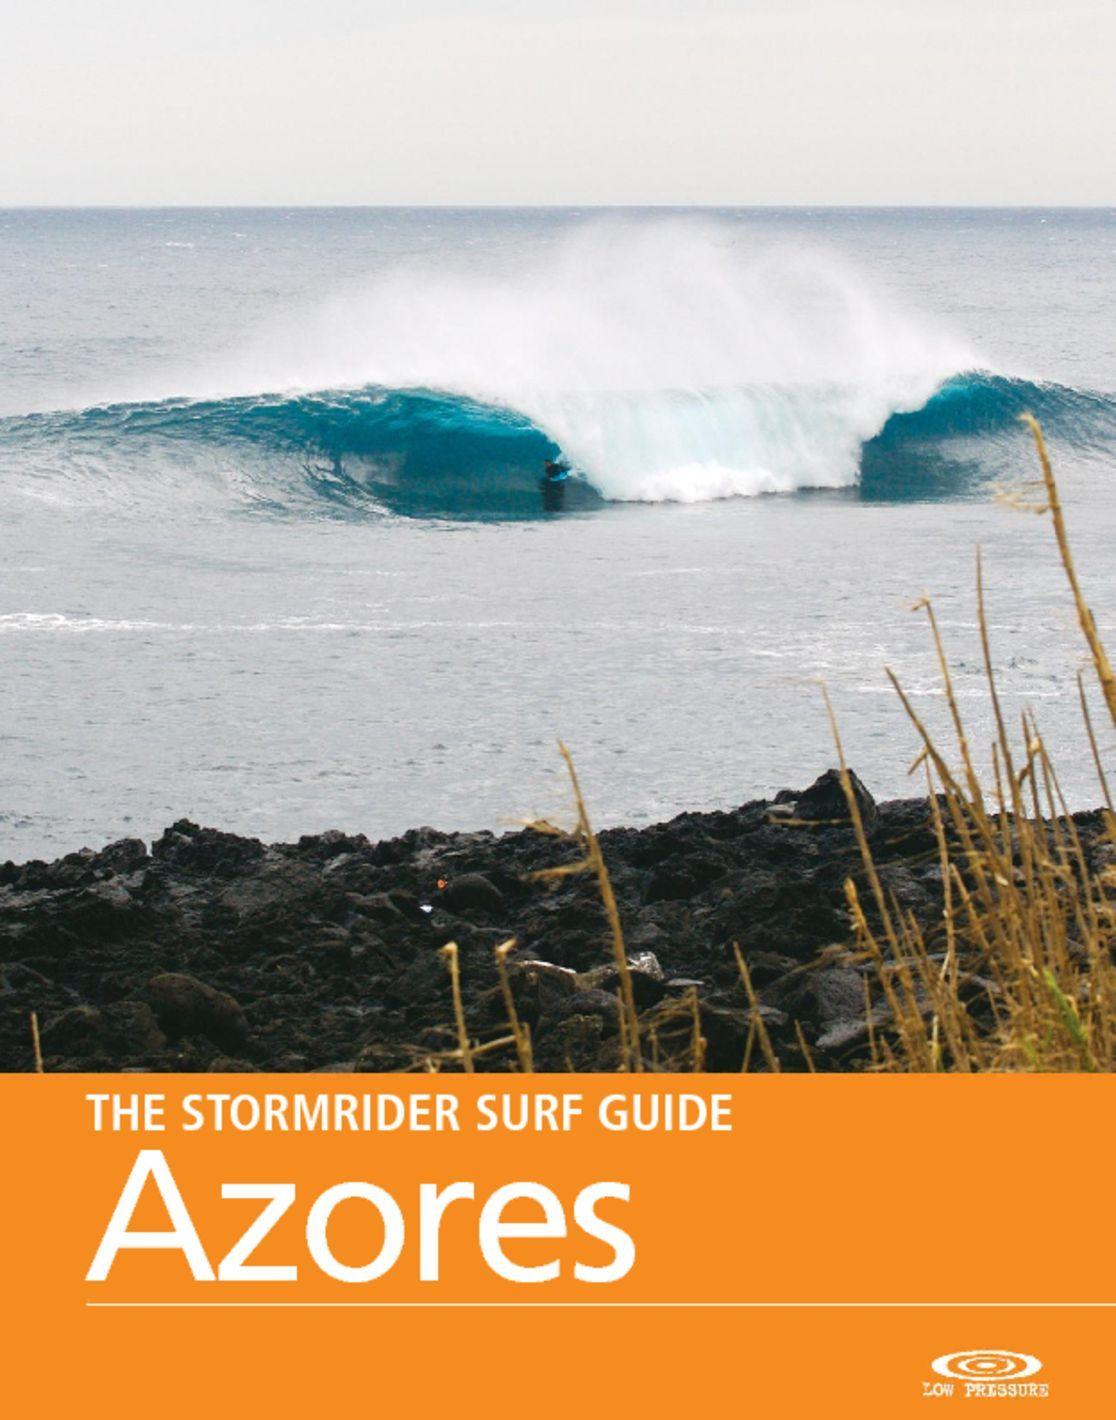 The Stormrider Surf Guide Azores Digital